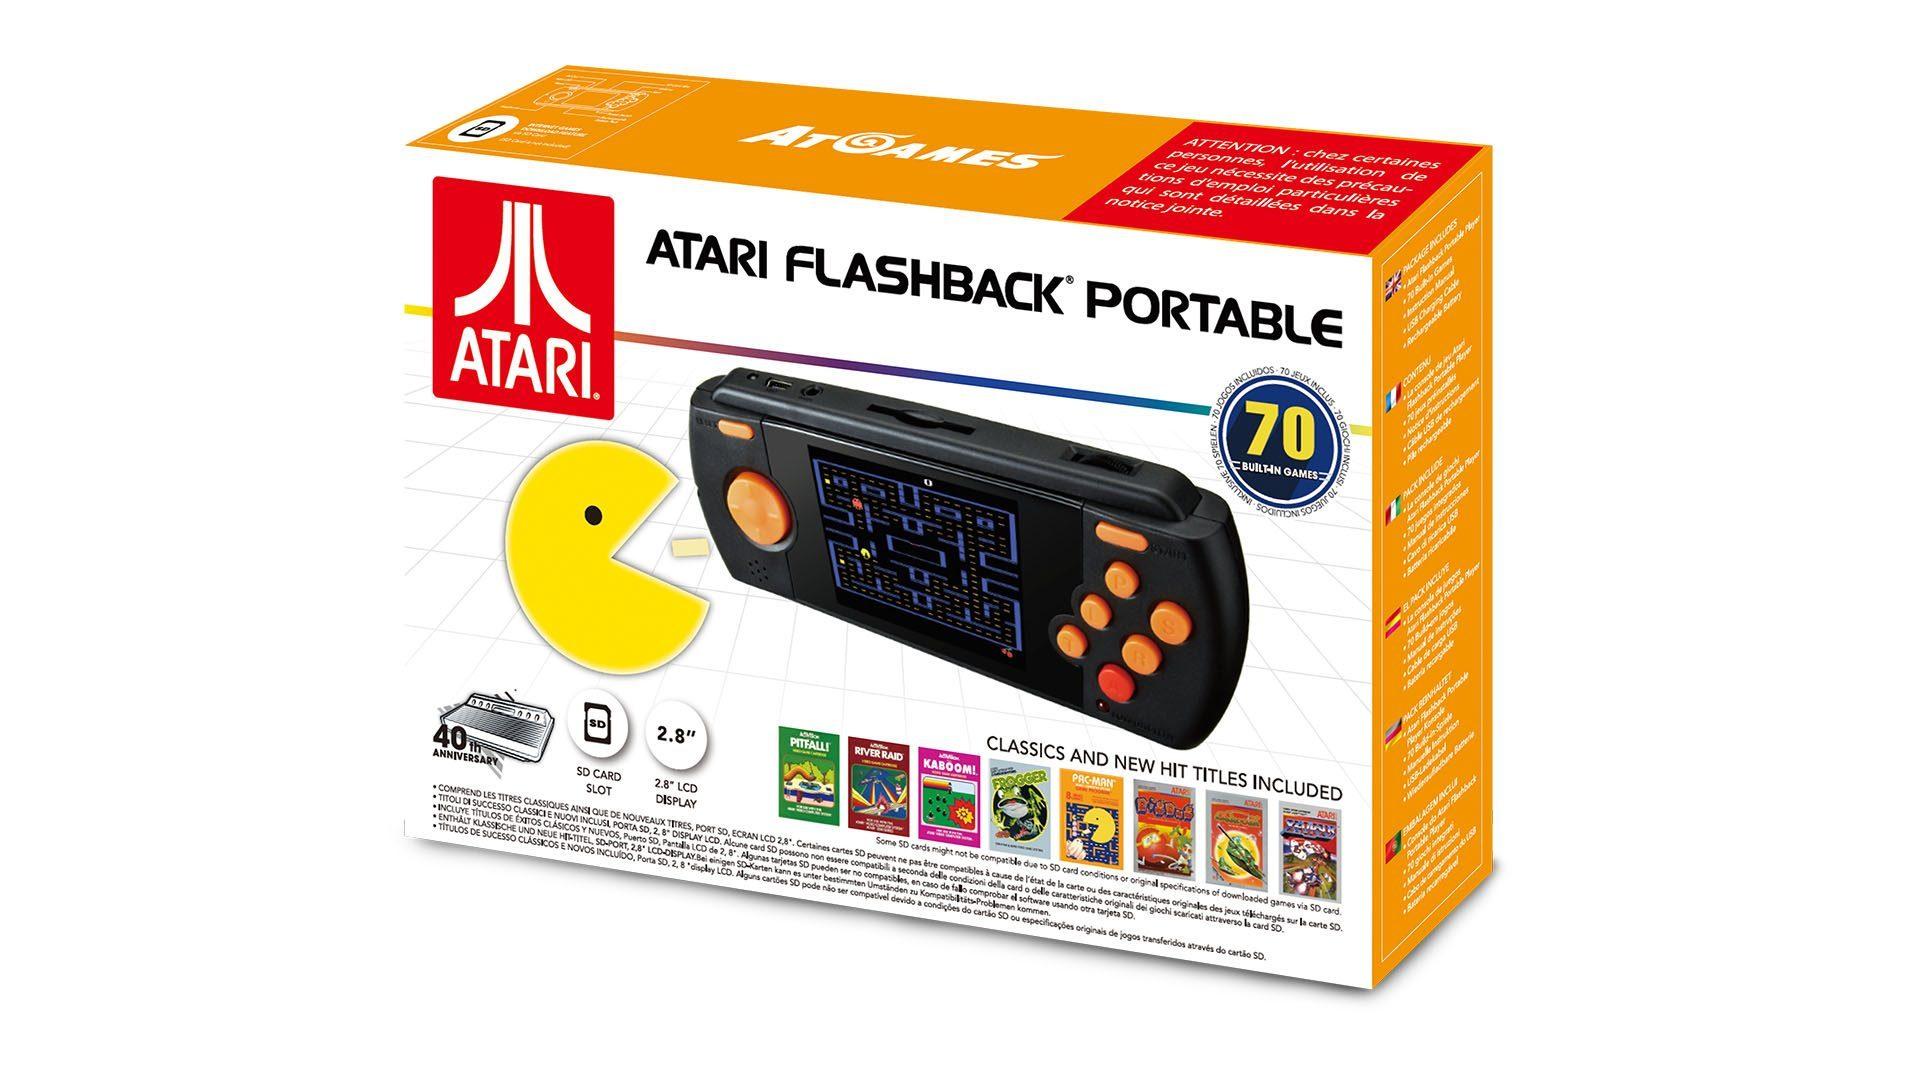 Atari_Flashback_Portable